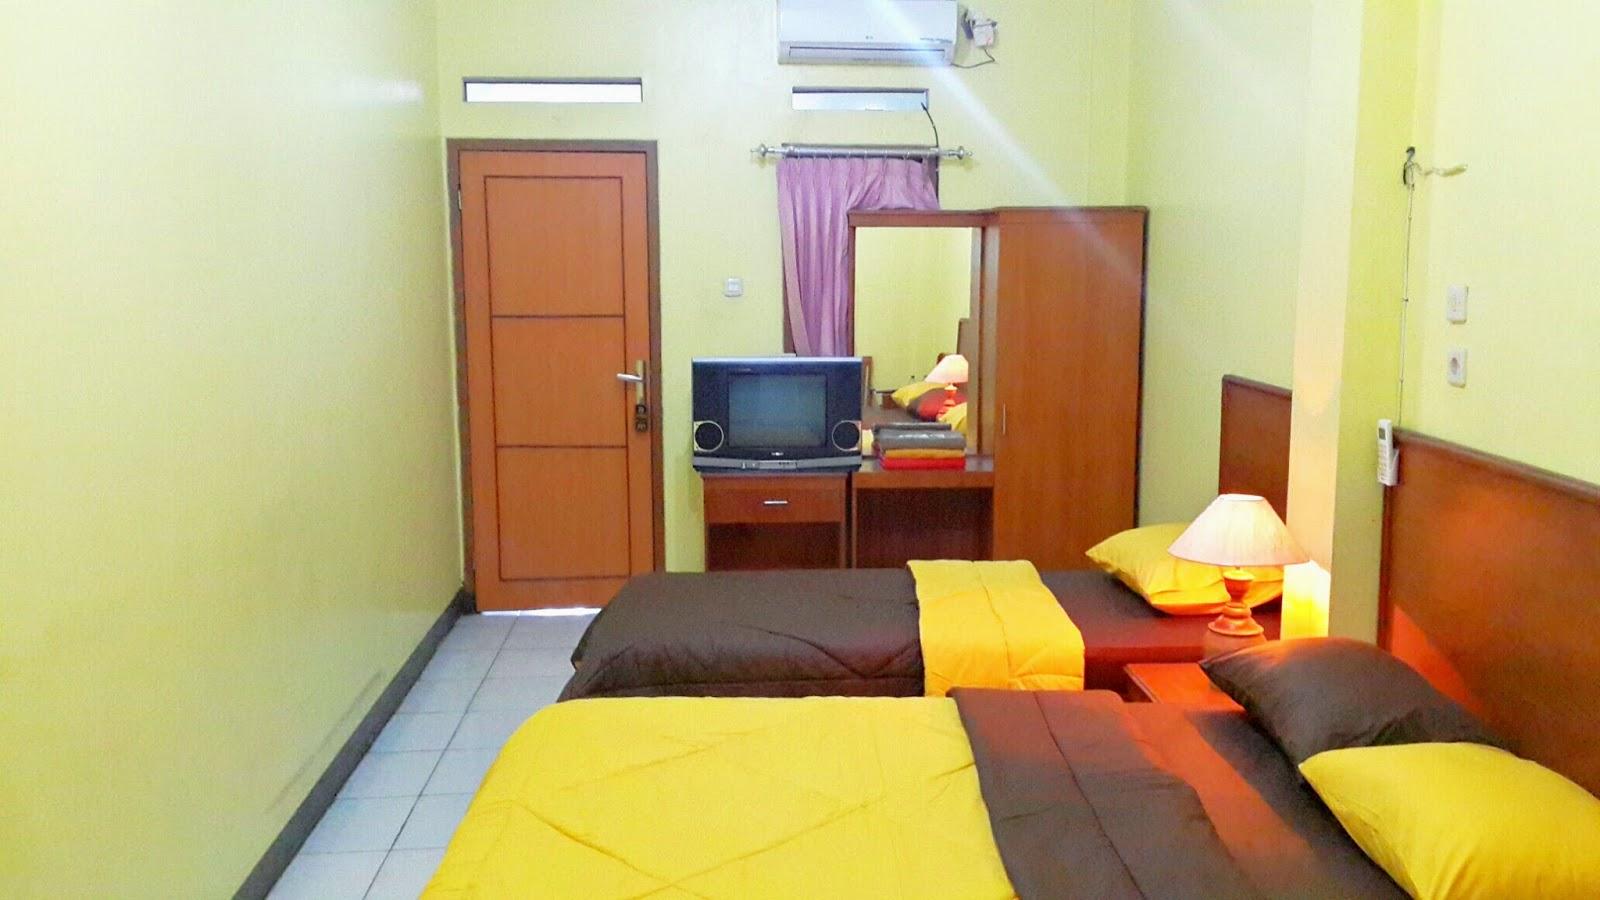 Hotel Murah Pondok Patradisa Di Bandung Bersih Dengan Fasilitas Baik Menyediakan Type Kamar Family Untuk Pelancong Keluarga